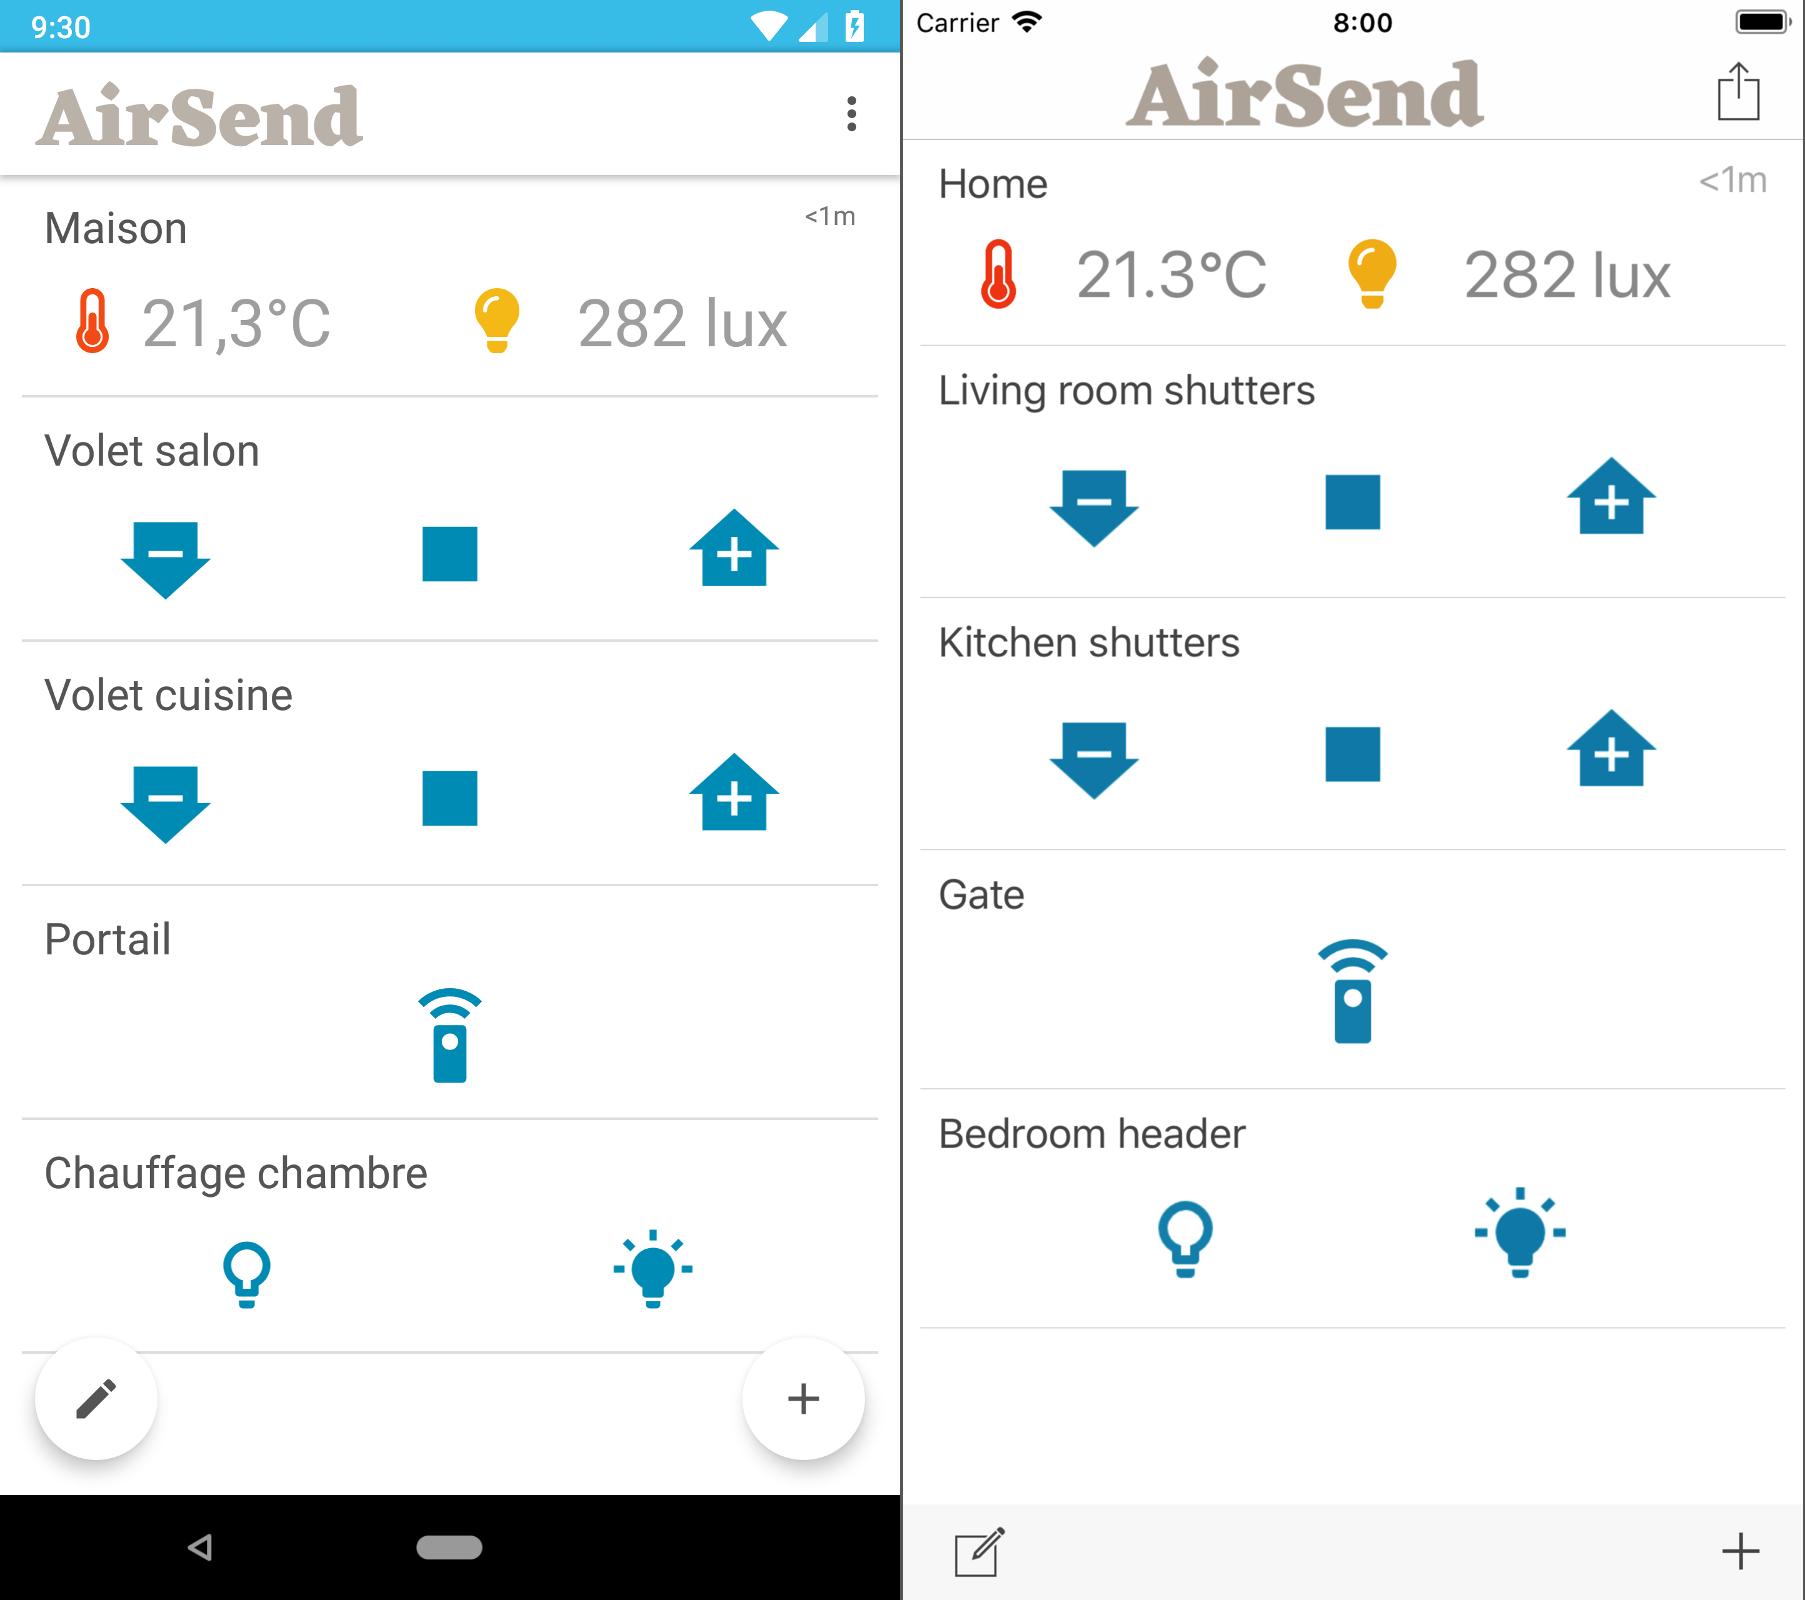 AirSend mobiles screenshots